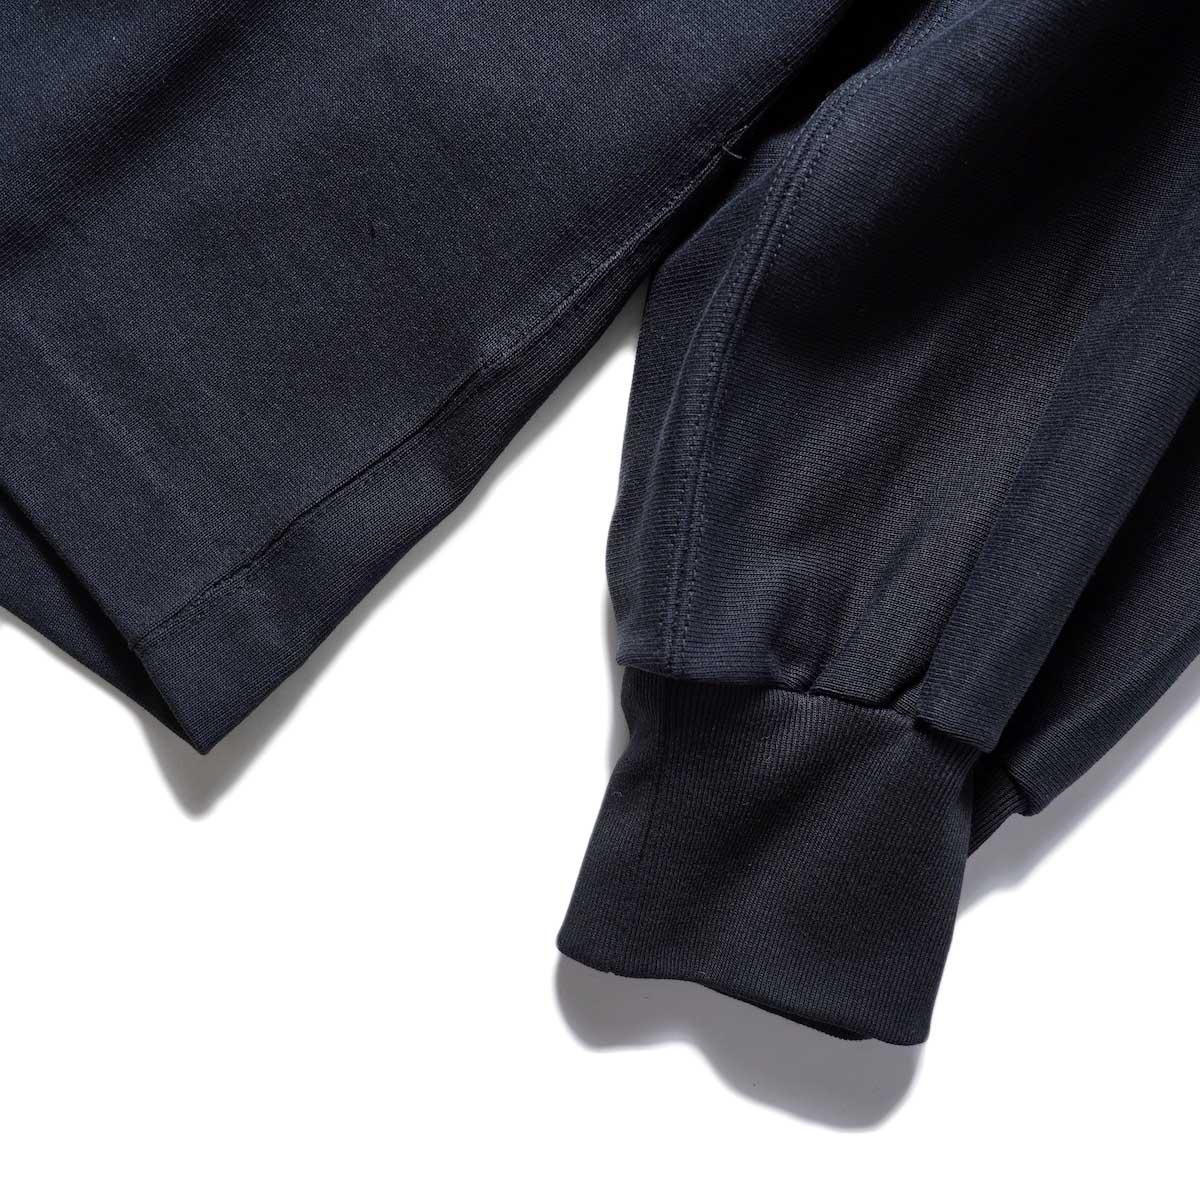 YLEVE / TWIST YARN COTTON BIG P/O (Black) 袖・リブ